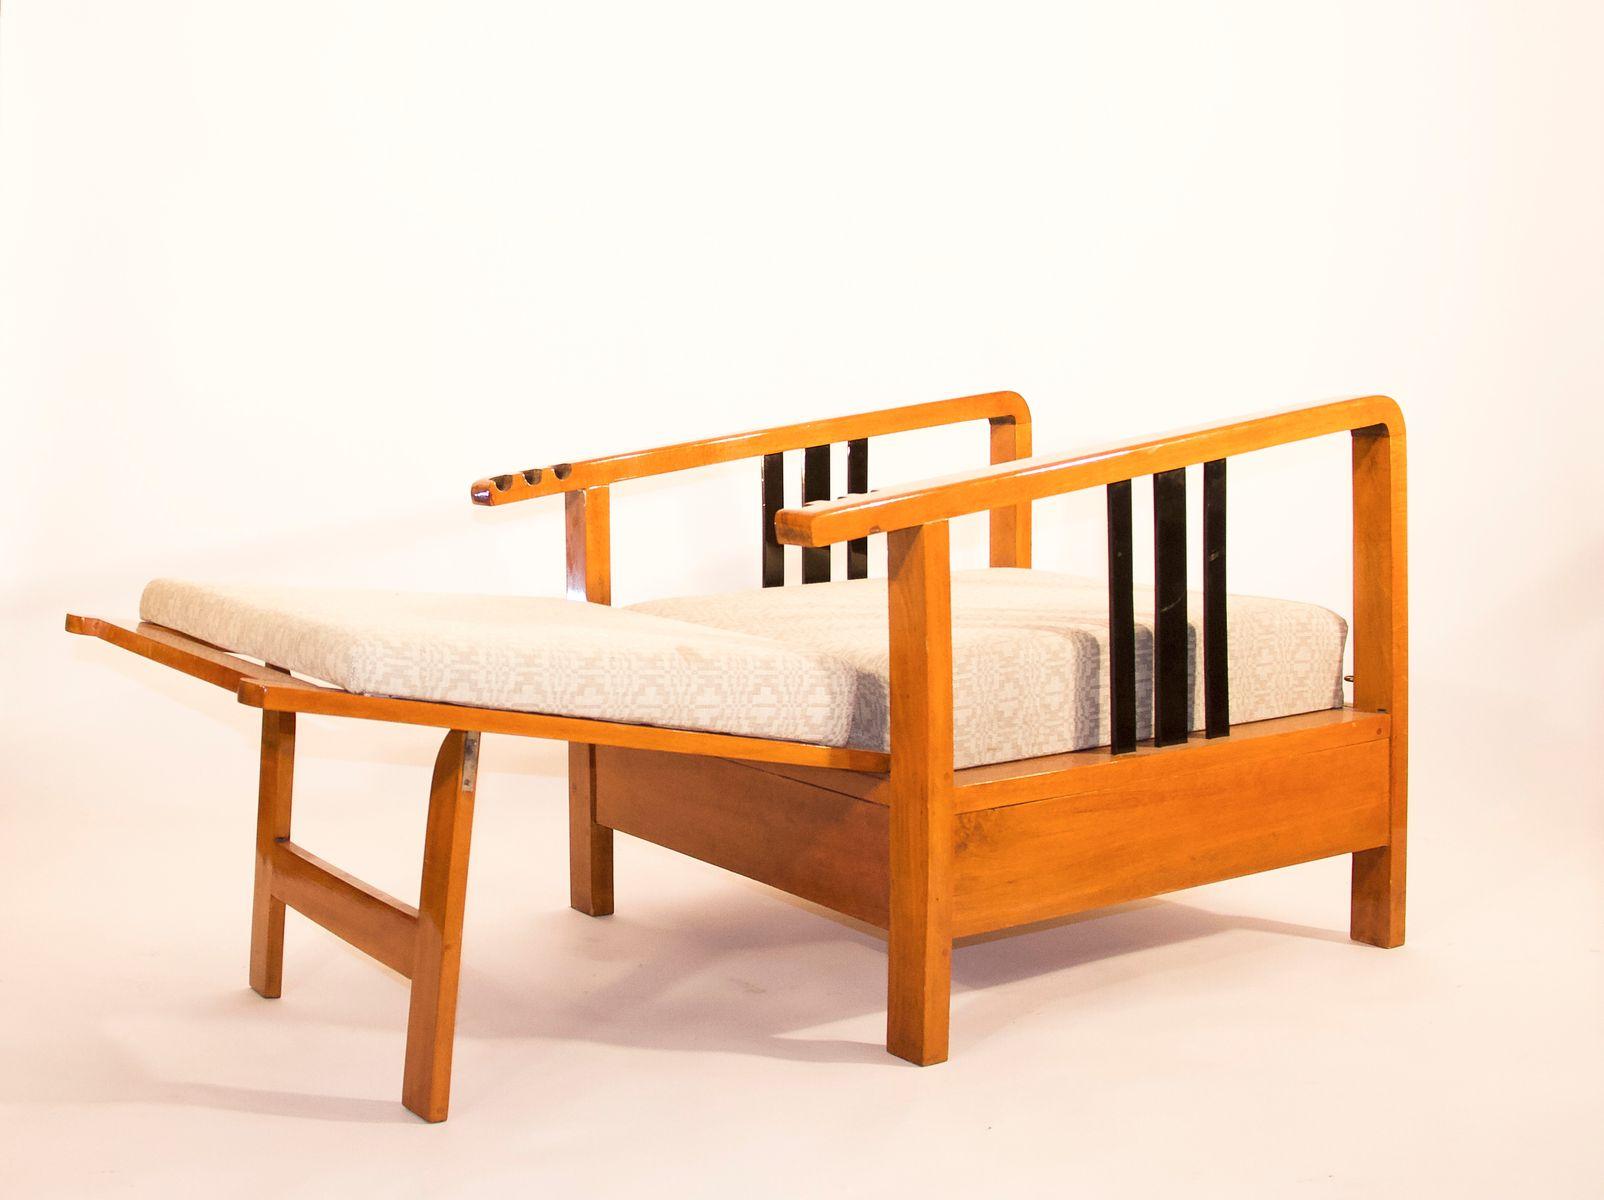 Art Deco Lounge Chair, 1930S 8 2,93500